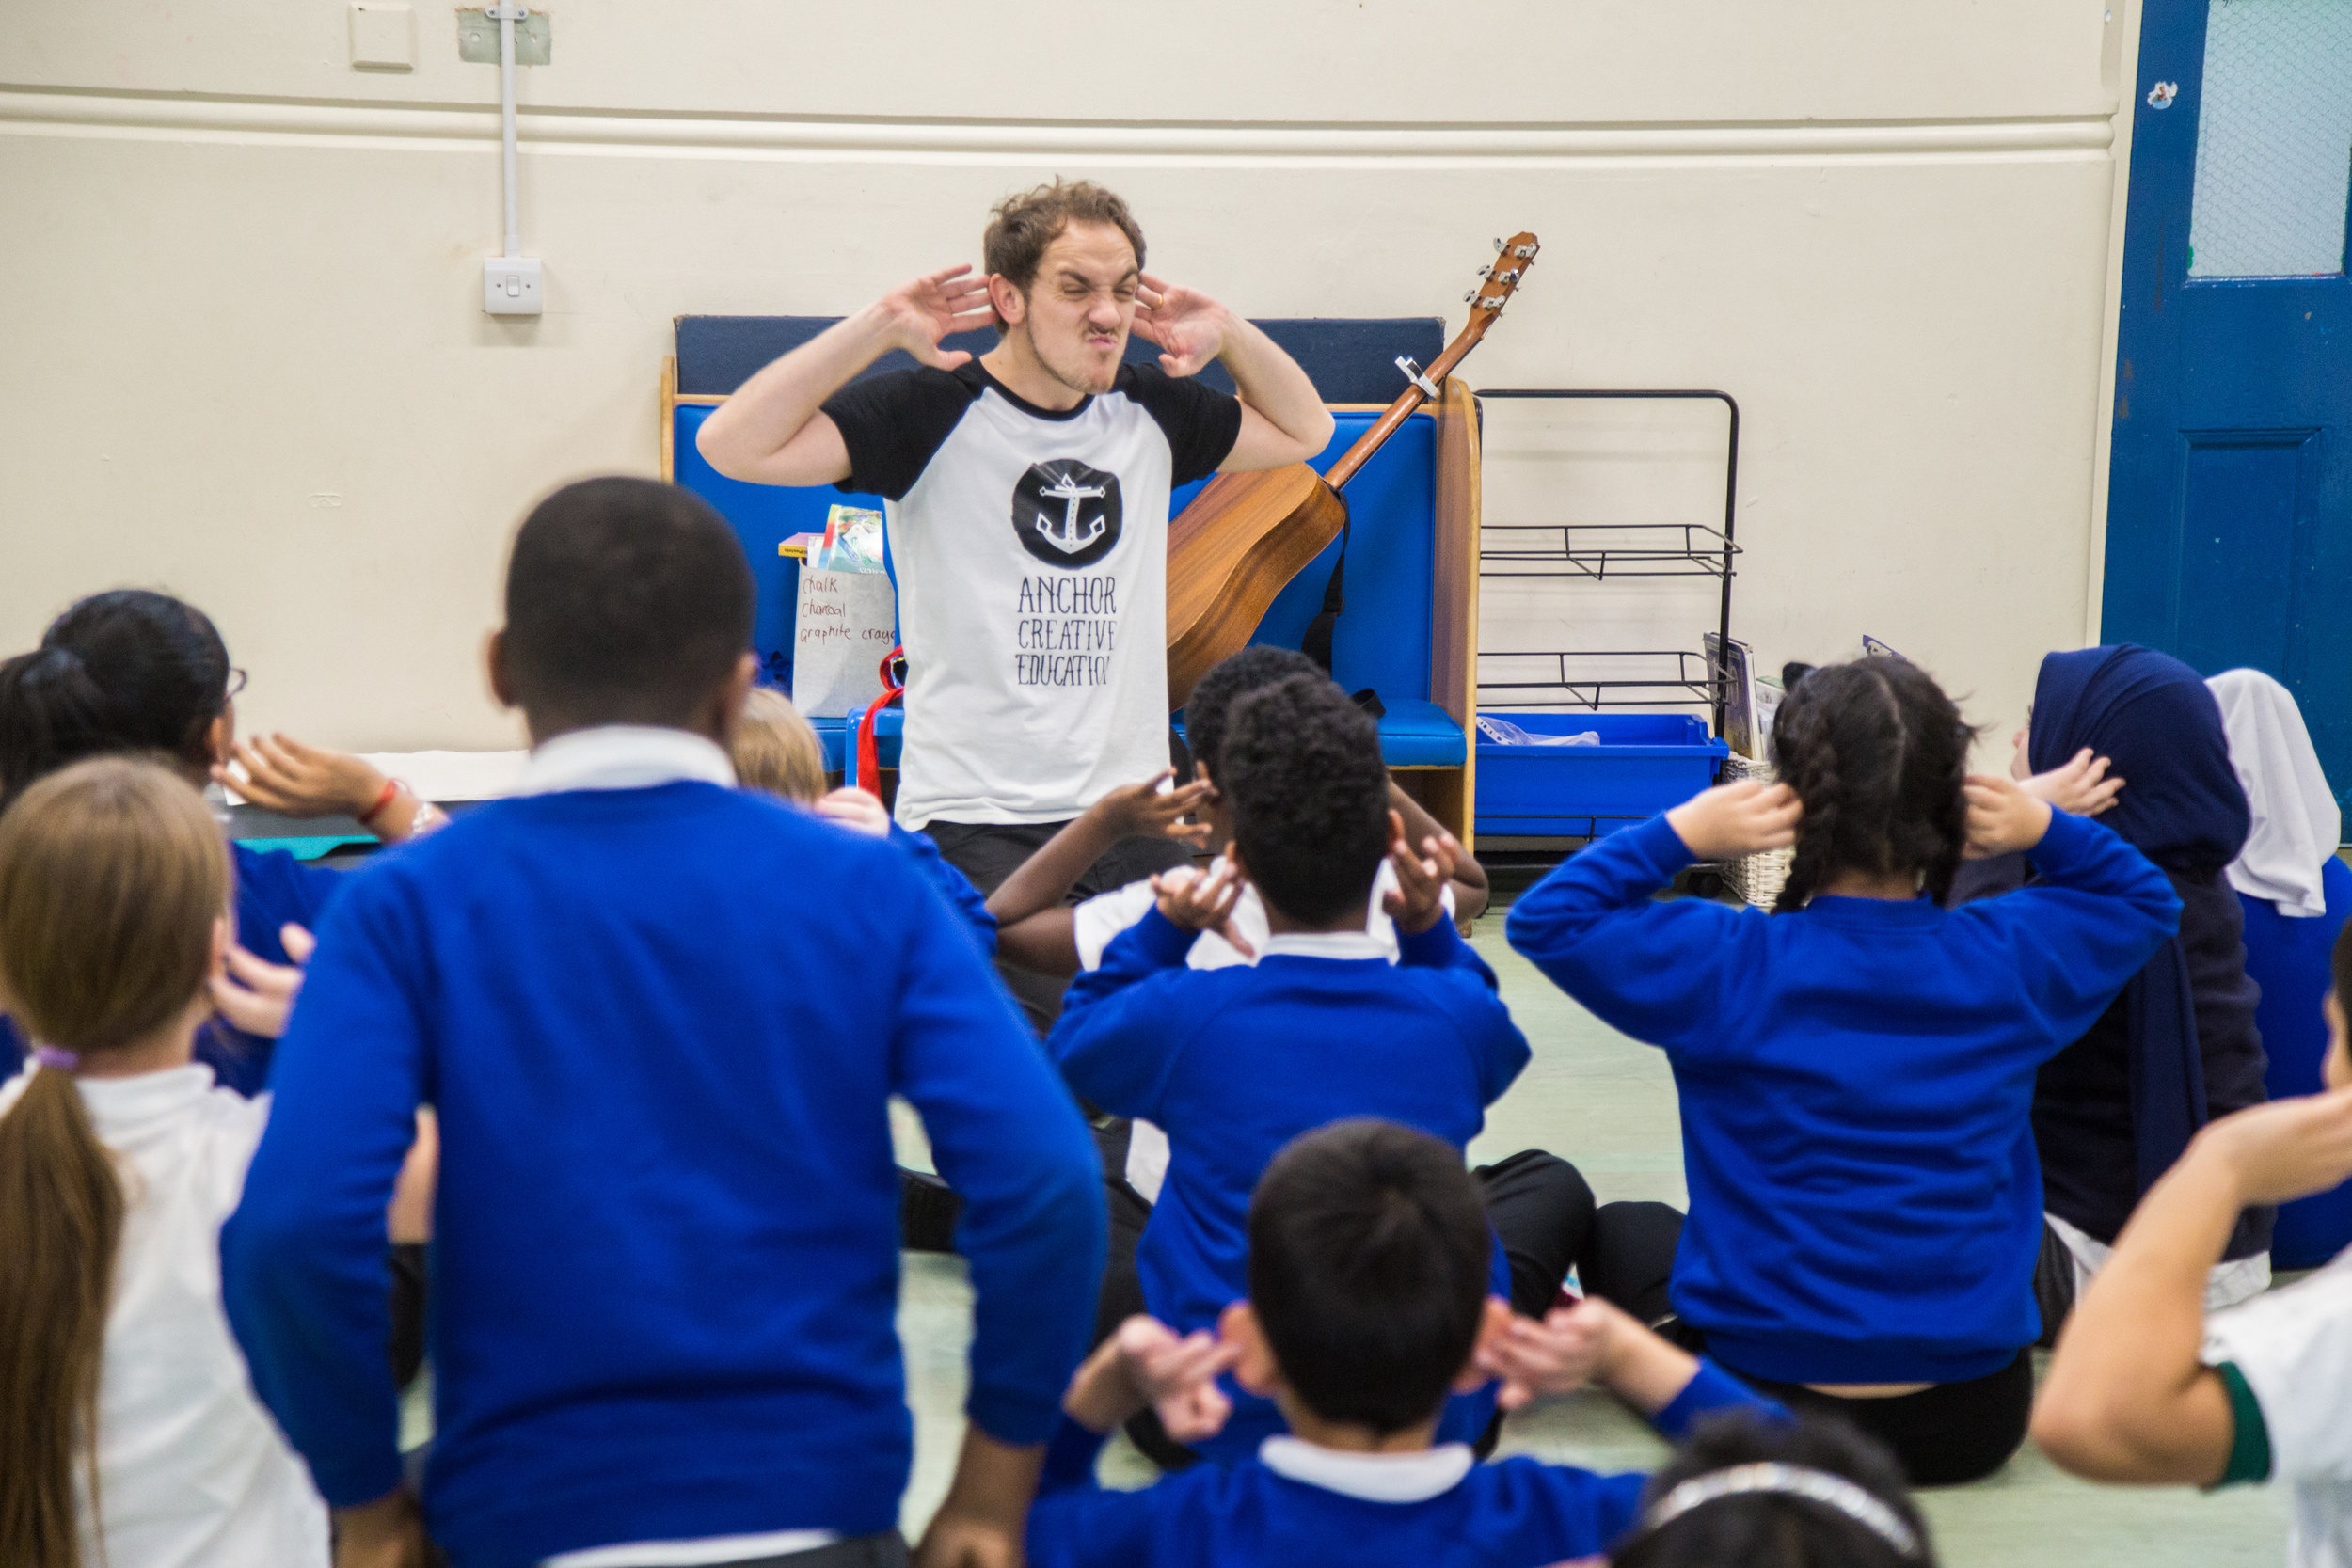 Price - Creative Literacy Partnership (A SPaG Drama Day per week)Full term (12-15 weeks) - £2,850Full School Year (36 weeks) - £7,950